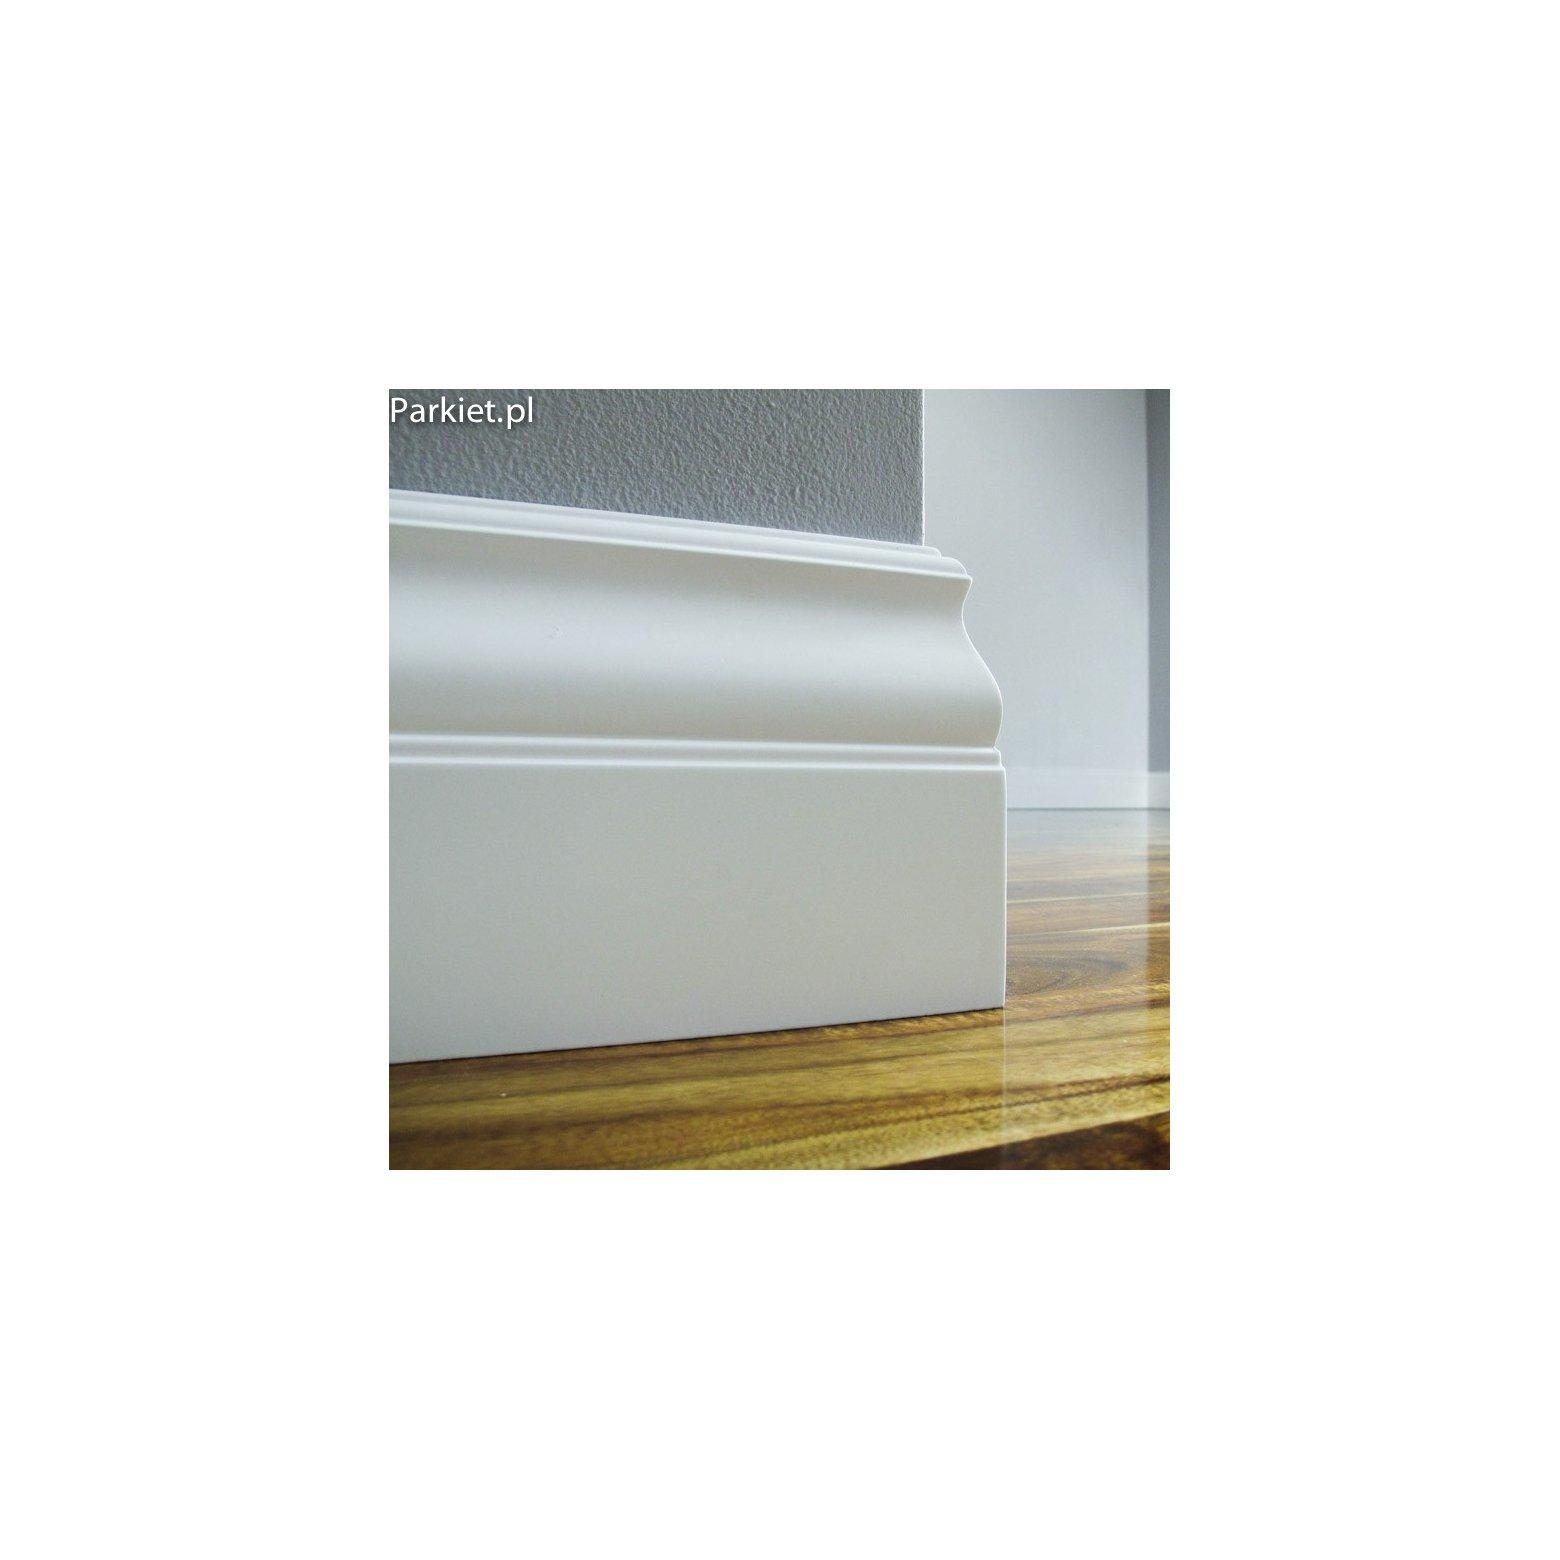 Biala listwa podlogowa lakierowana - Avila